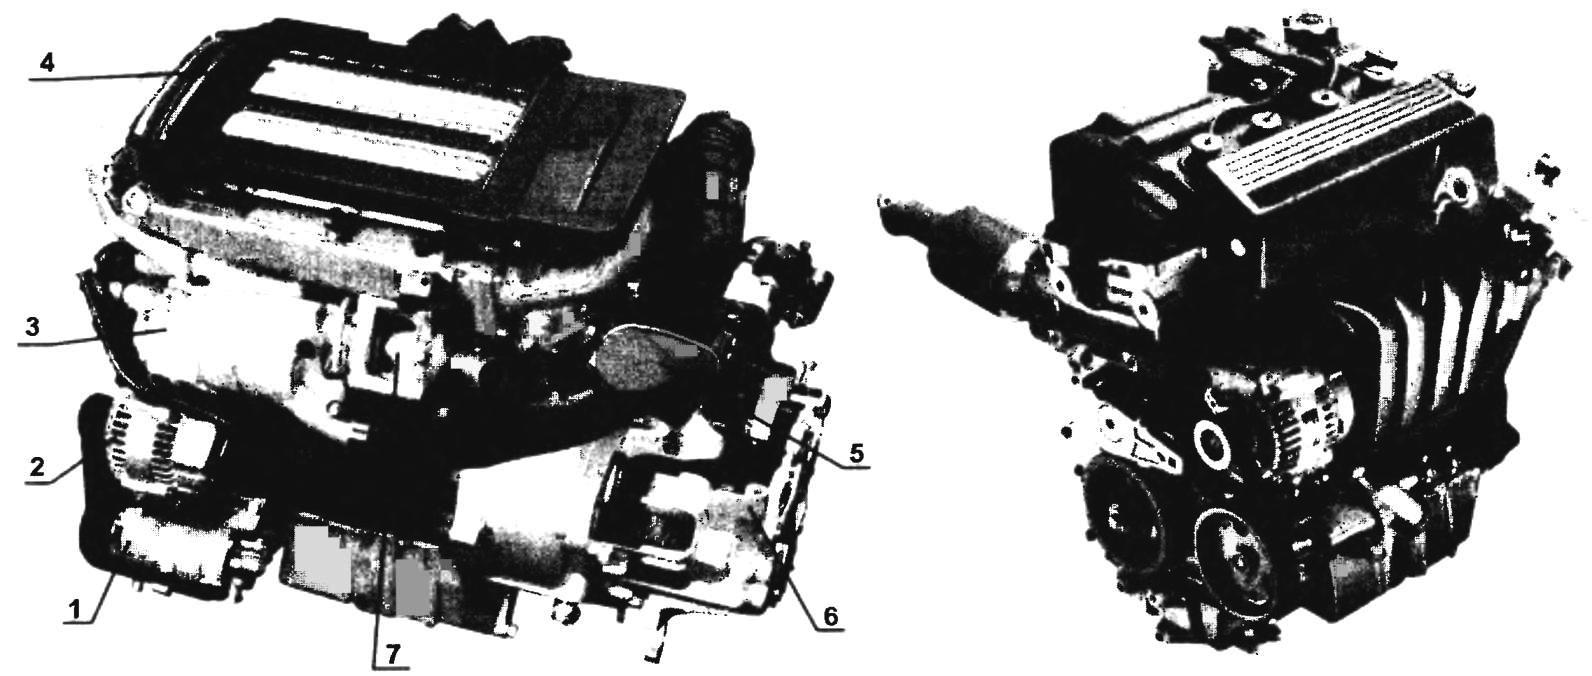 Двигатели автомобилей MINI COOPER S (слева) и MINI COOPER (справа)